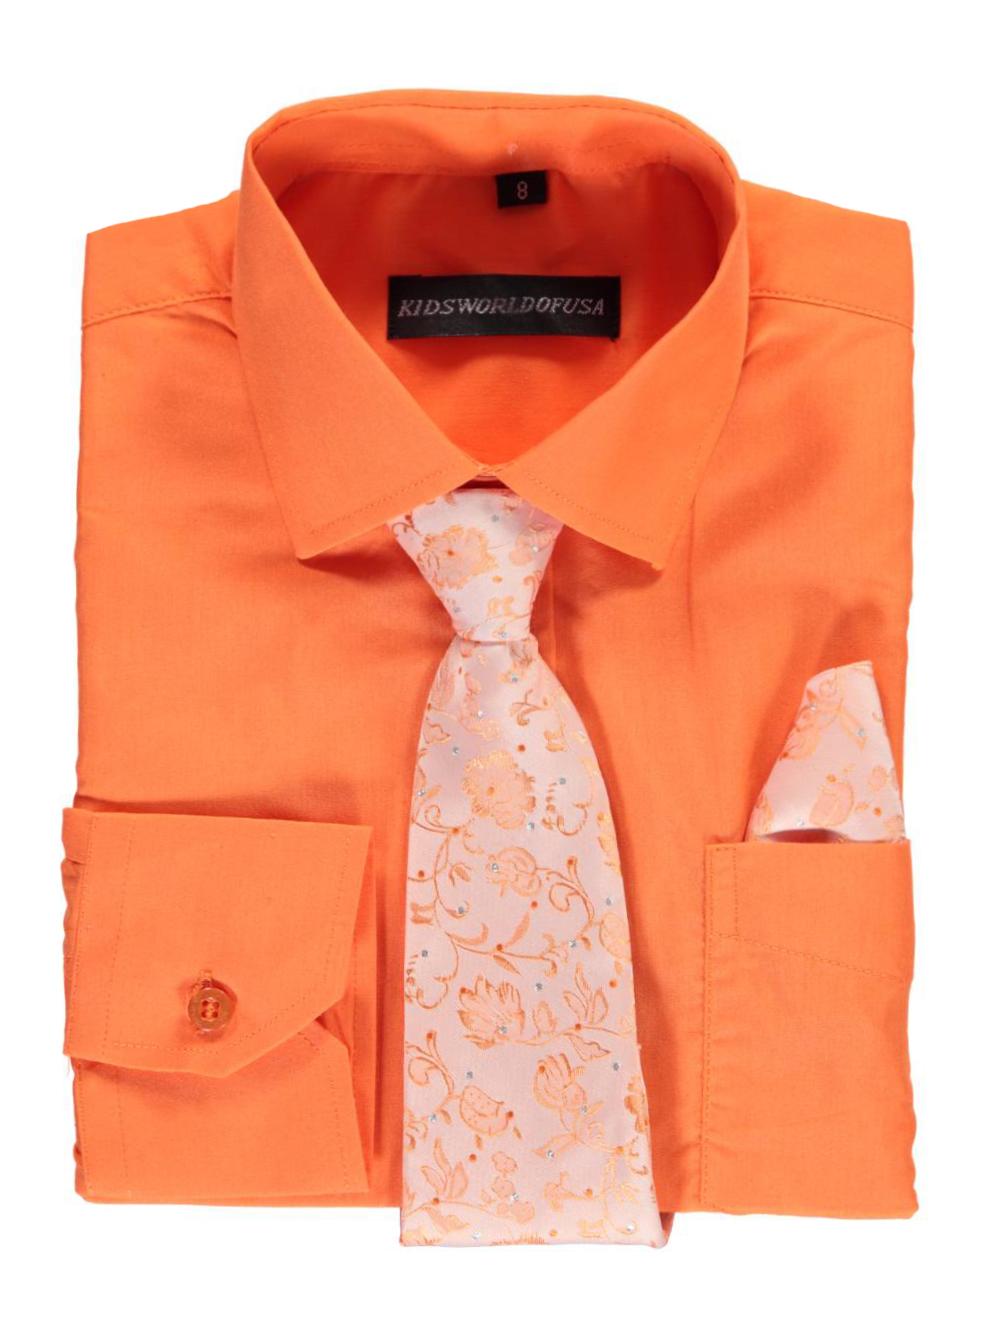 Kids World Big Boys' Dress Shirt with Accessories (Sizes 8 - 20) - orange, 20